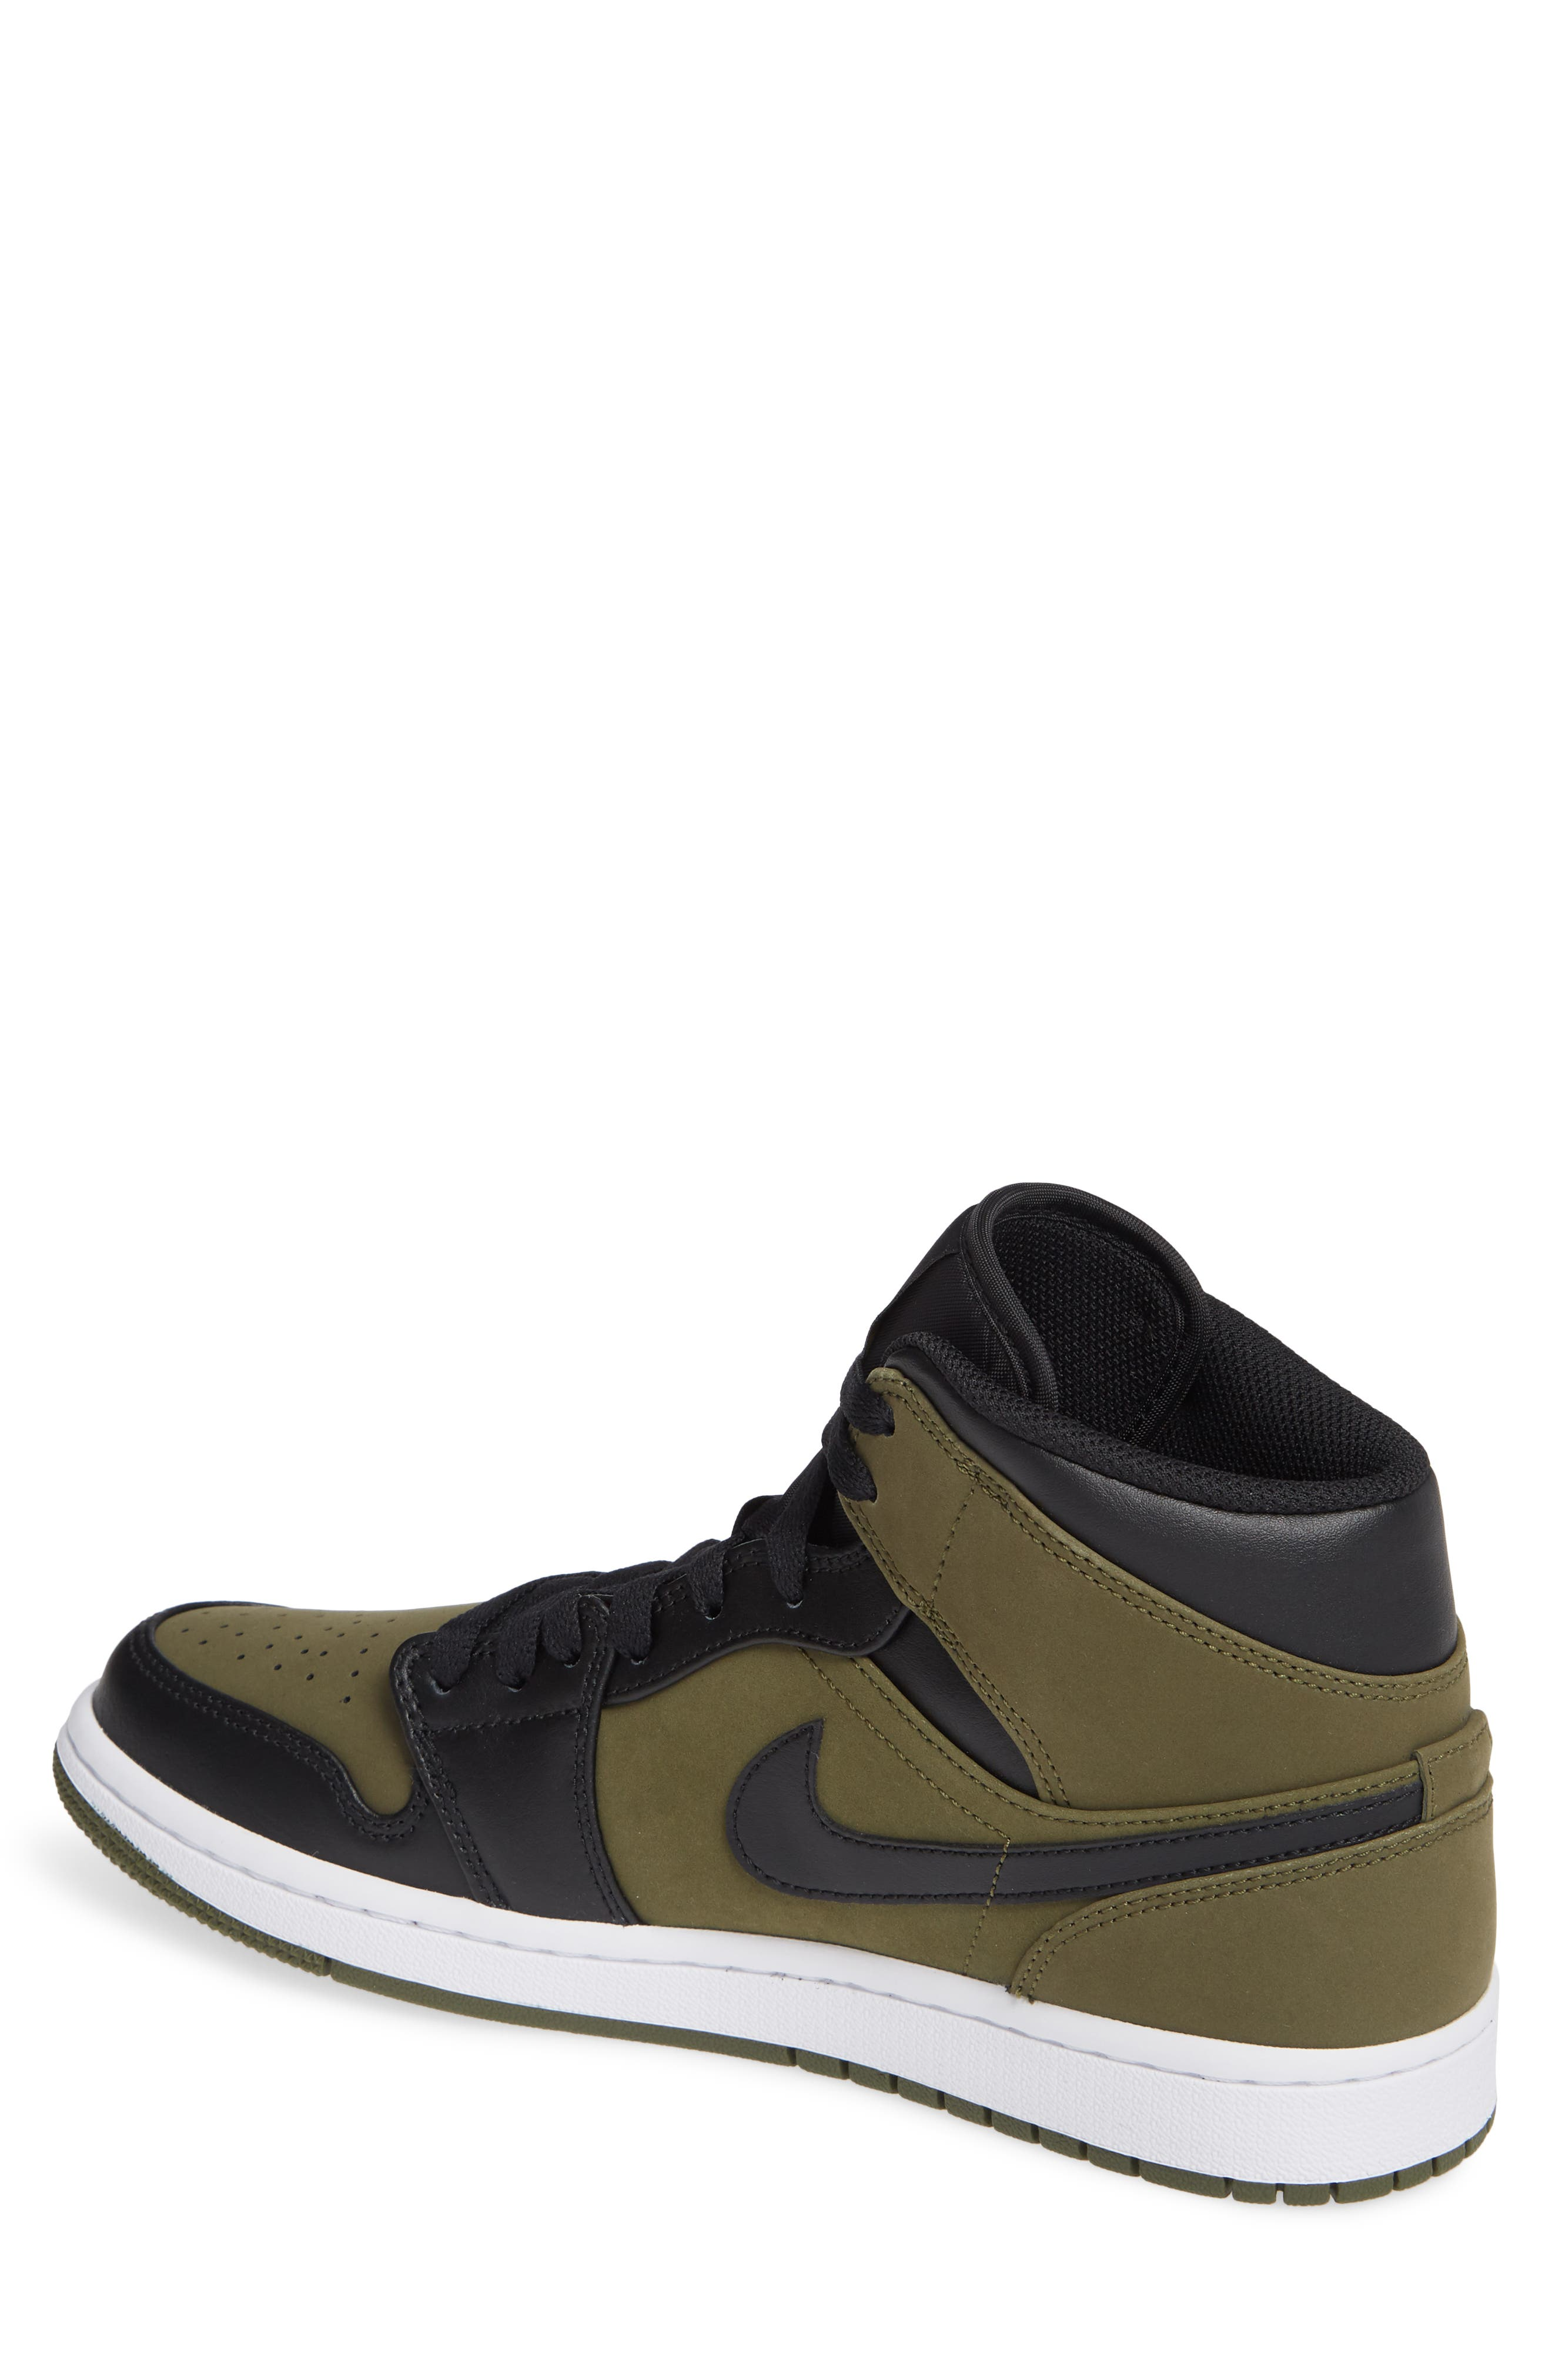 'Air Jordan 1 Mid' Sneaker,                             Alternate thumbnail 2, color,                             OLIVE CANVAS/ BLACK/ WHITE